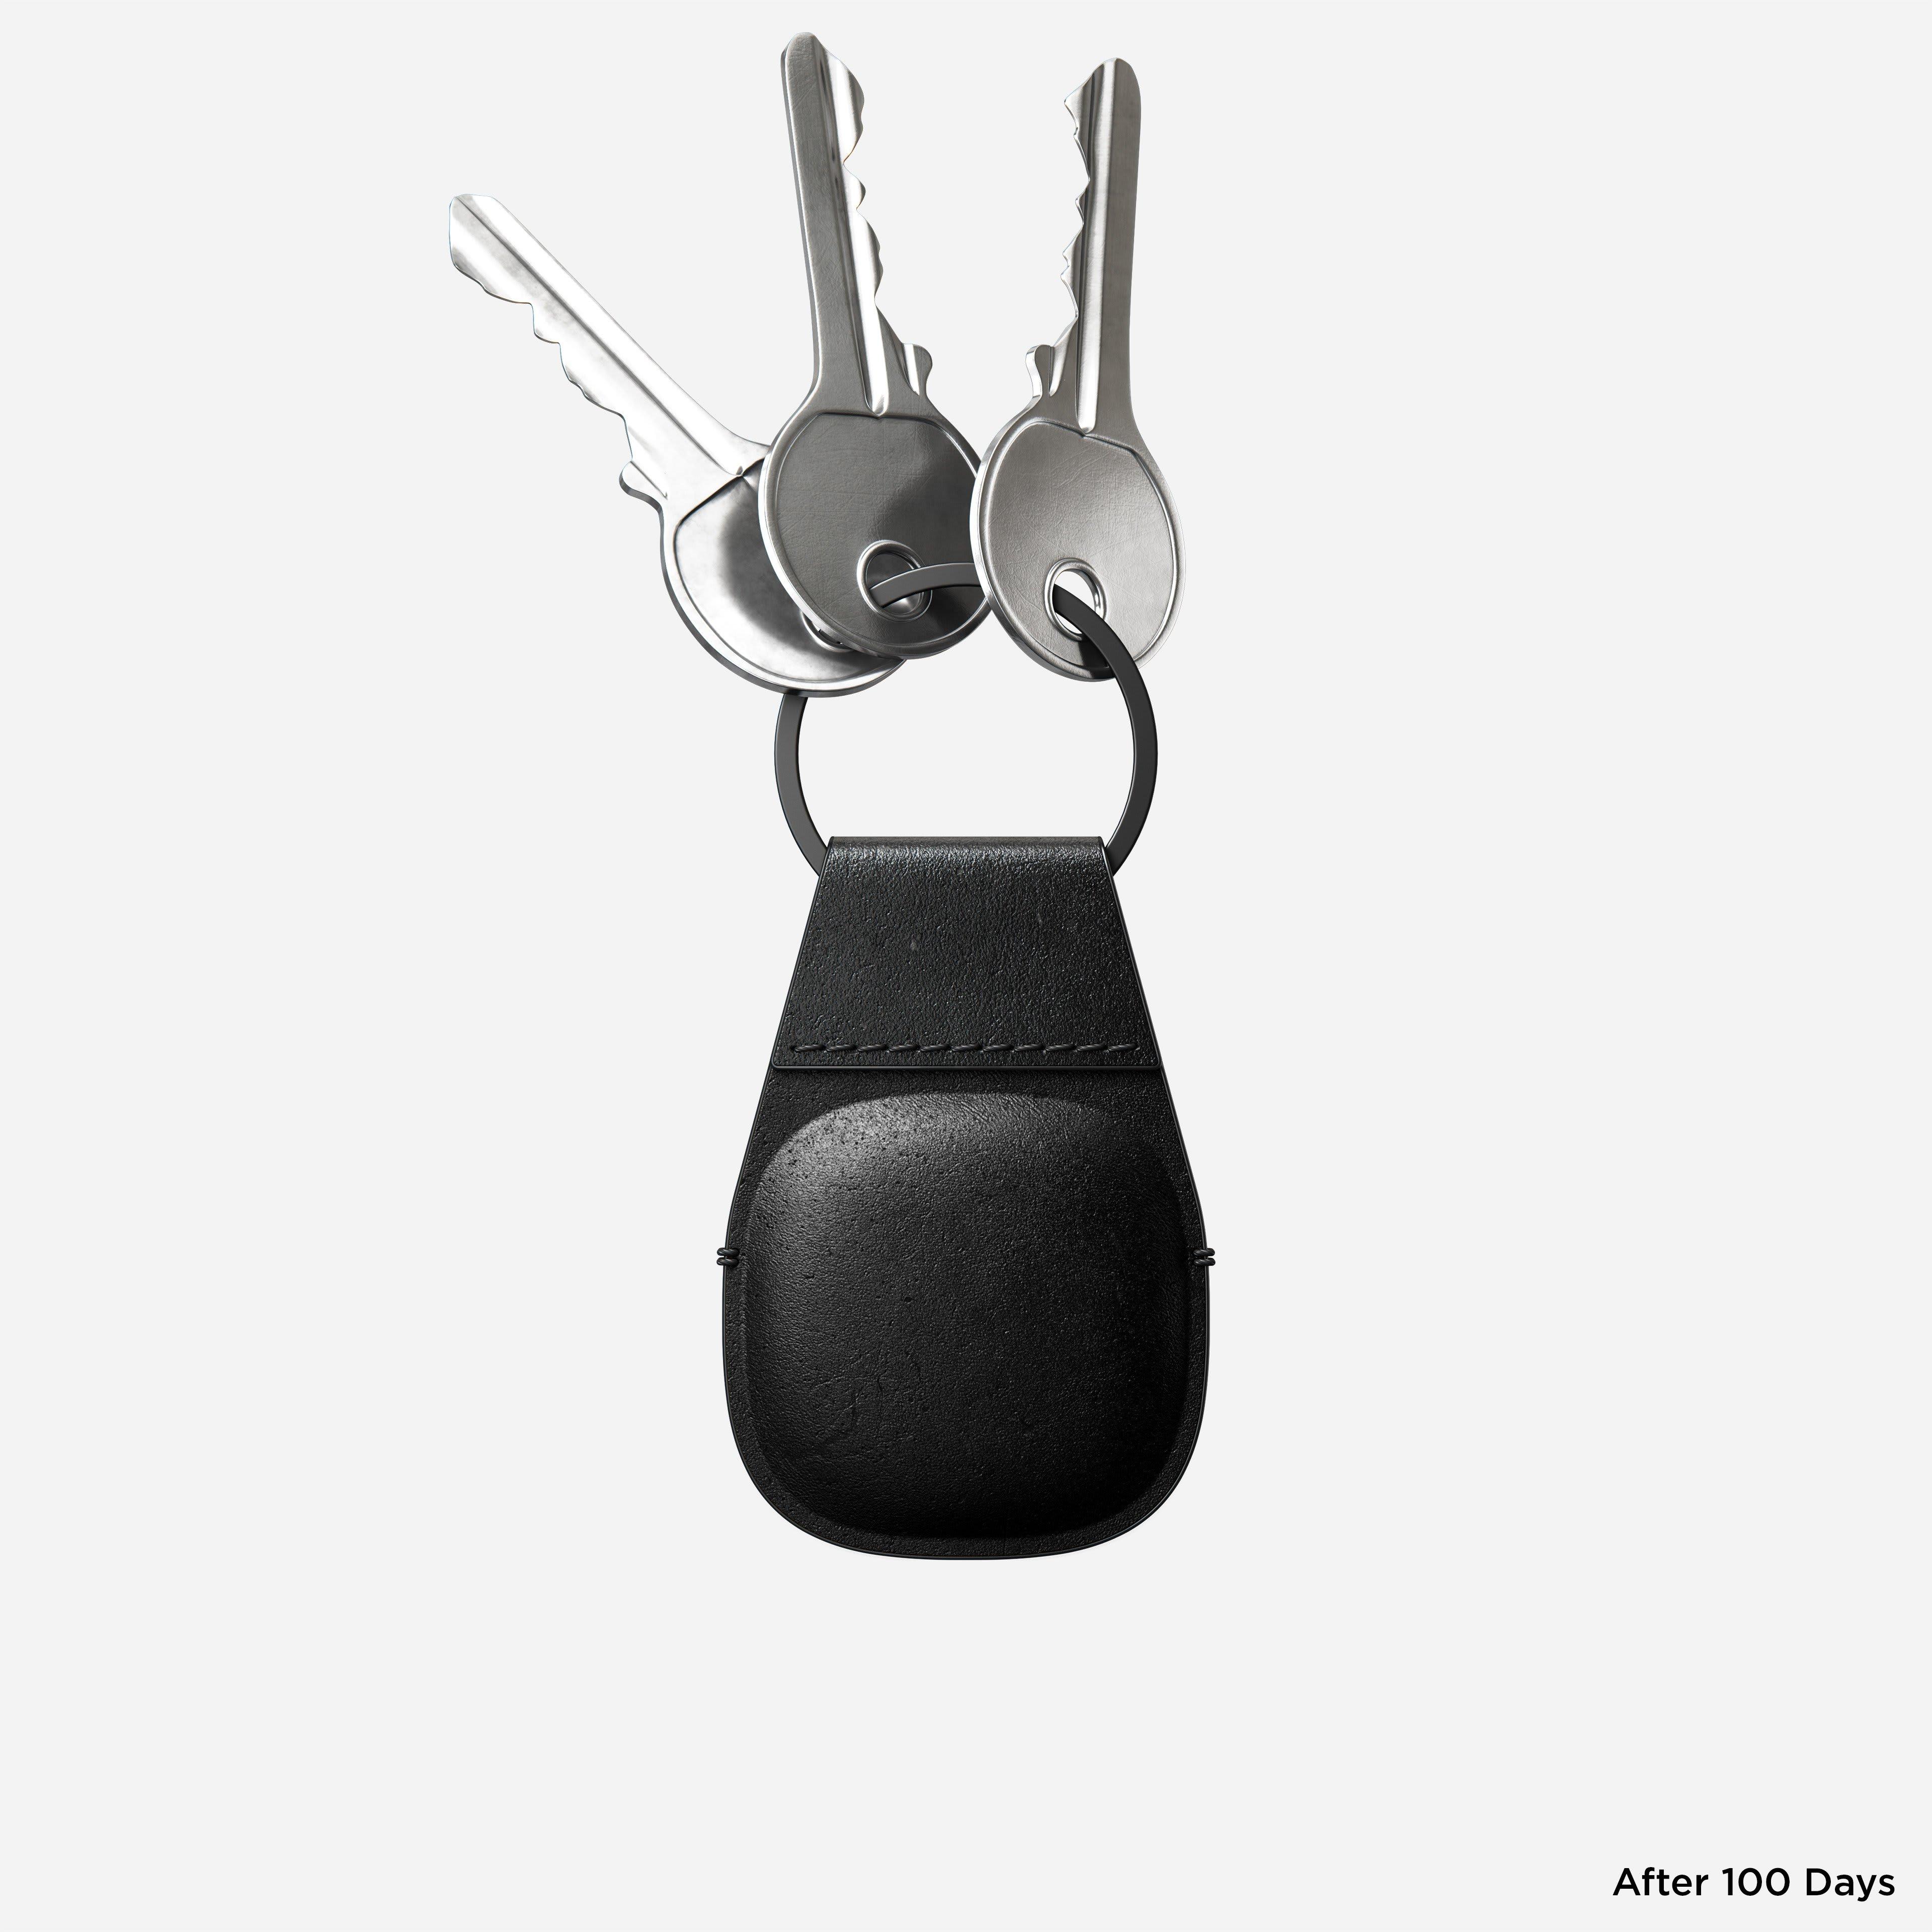 Nomad AirTag keychain